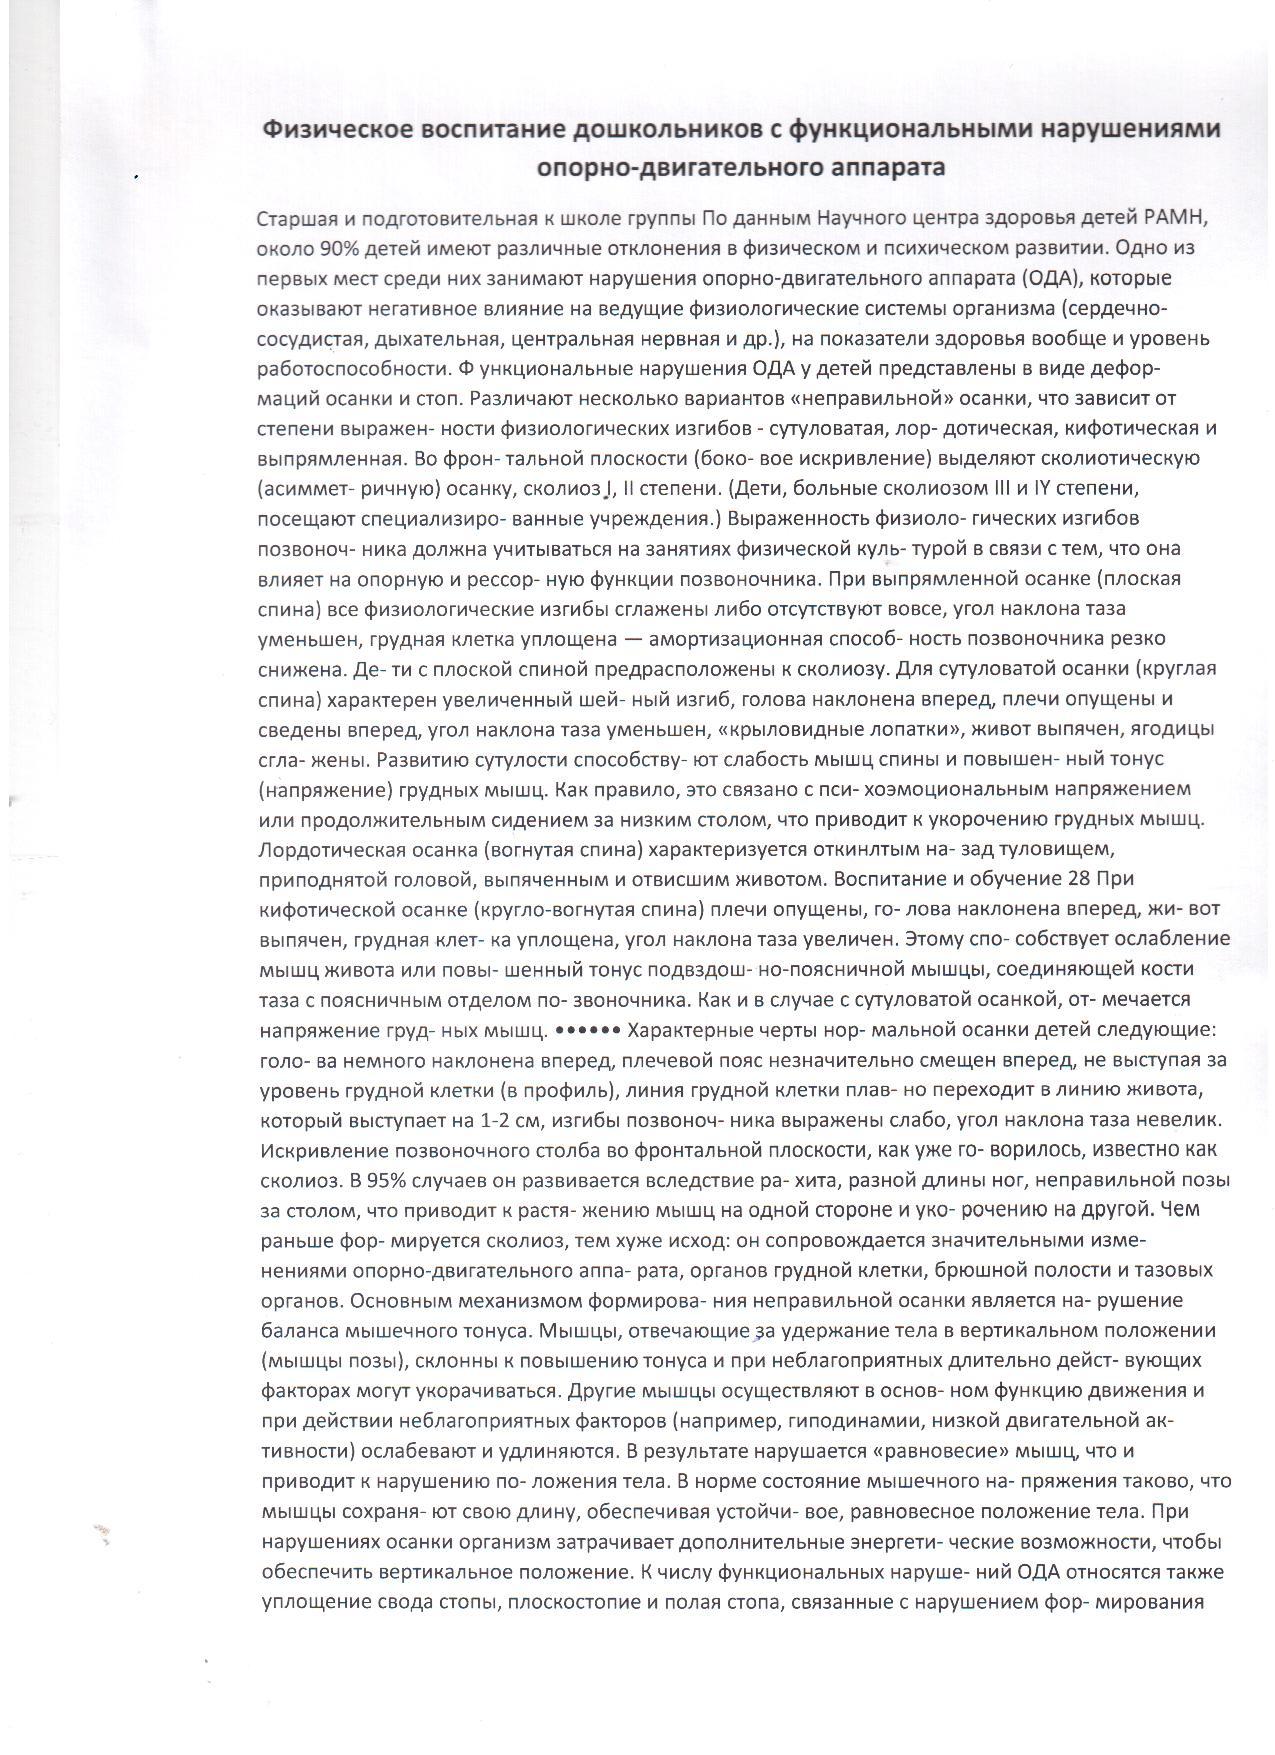 F:\для Татьяны Юрьевны доклады амировой\2\2.jpg